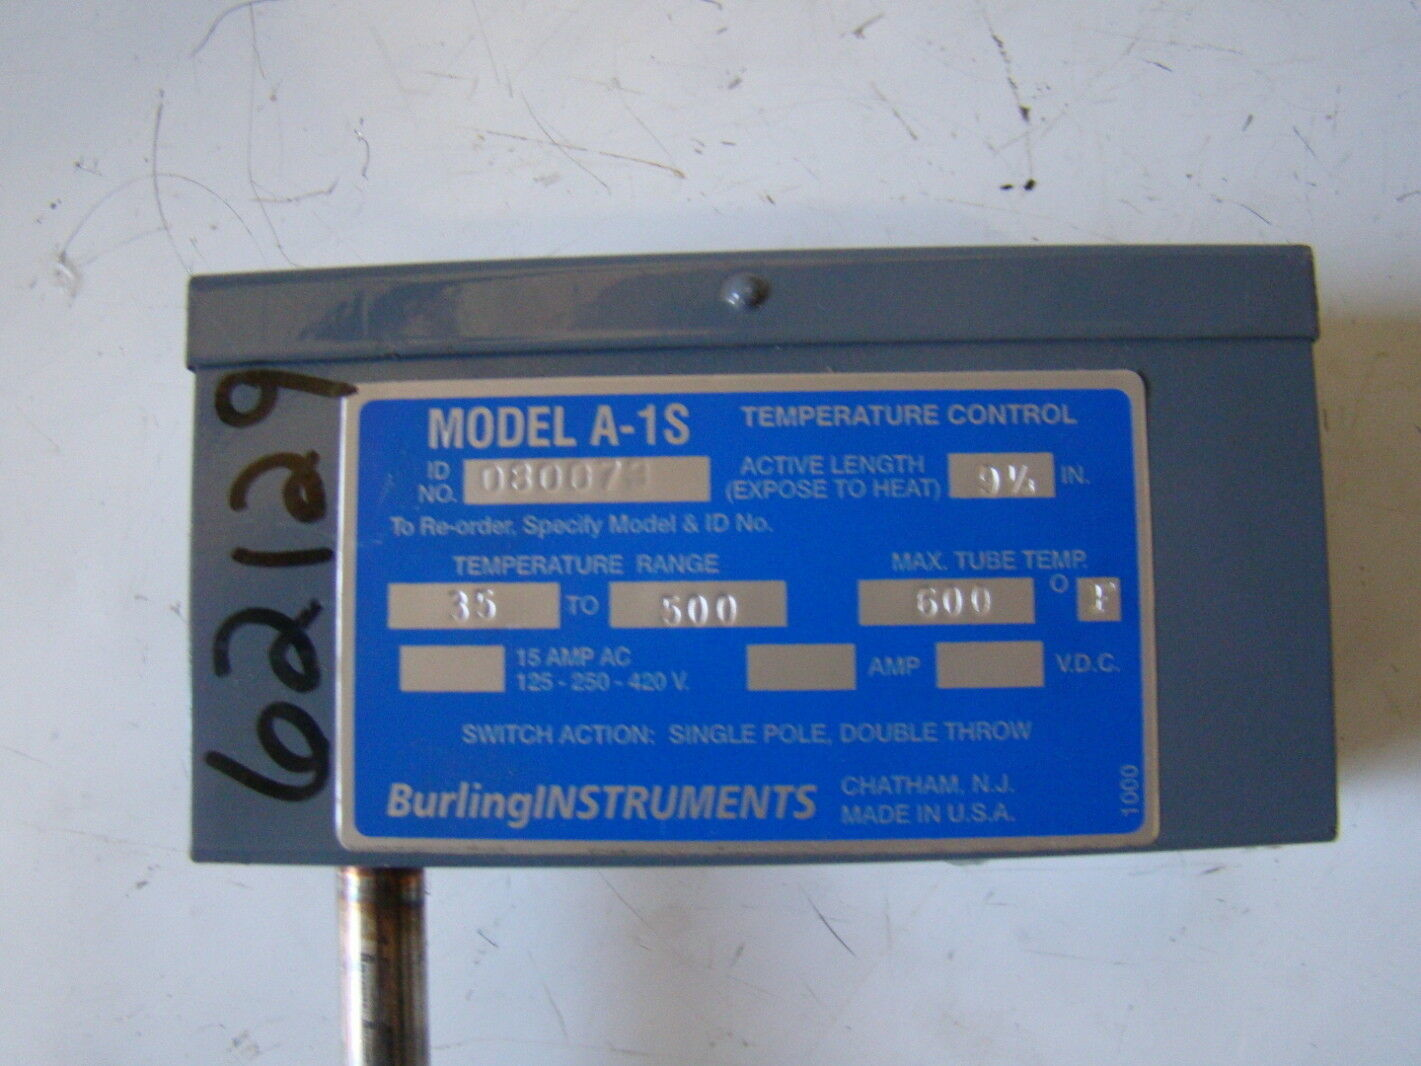 Burling Instruments Temperature Control A 1S Joseph Fazzio  #0347B1